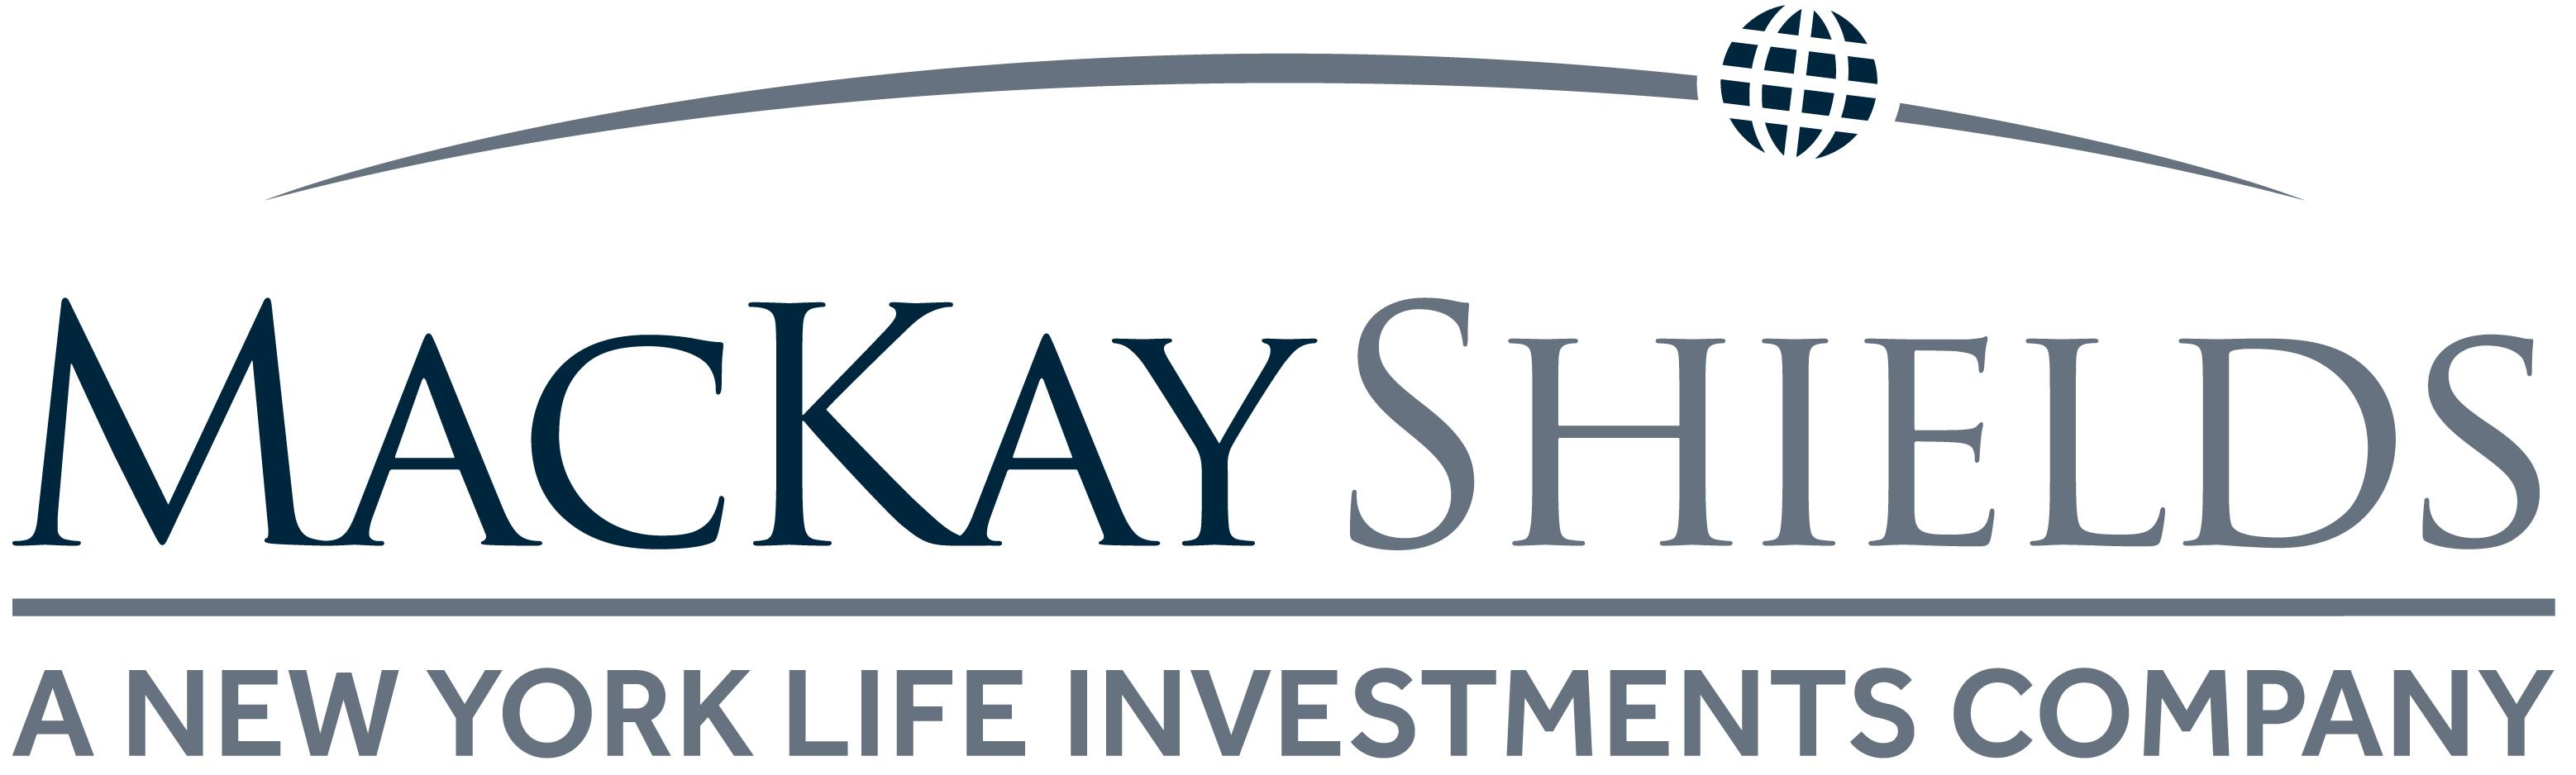 MacKay Shields - A New York life Investments Company